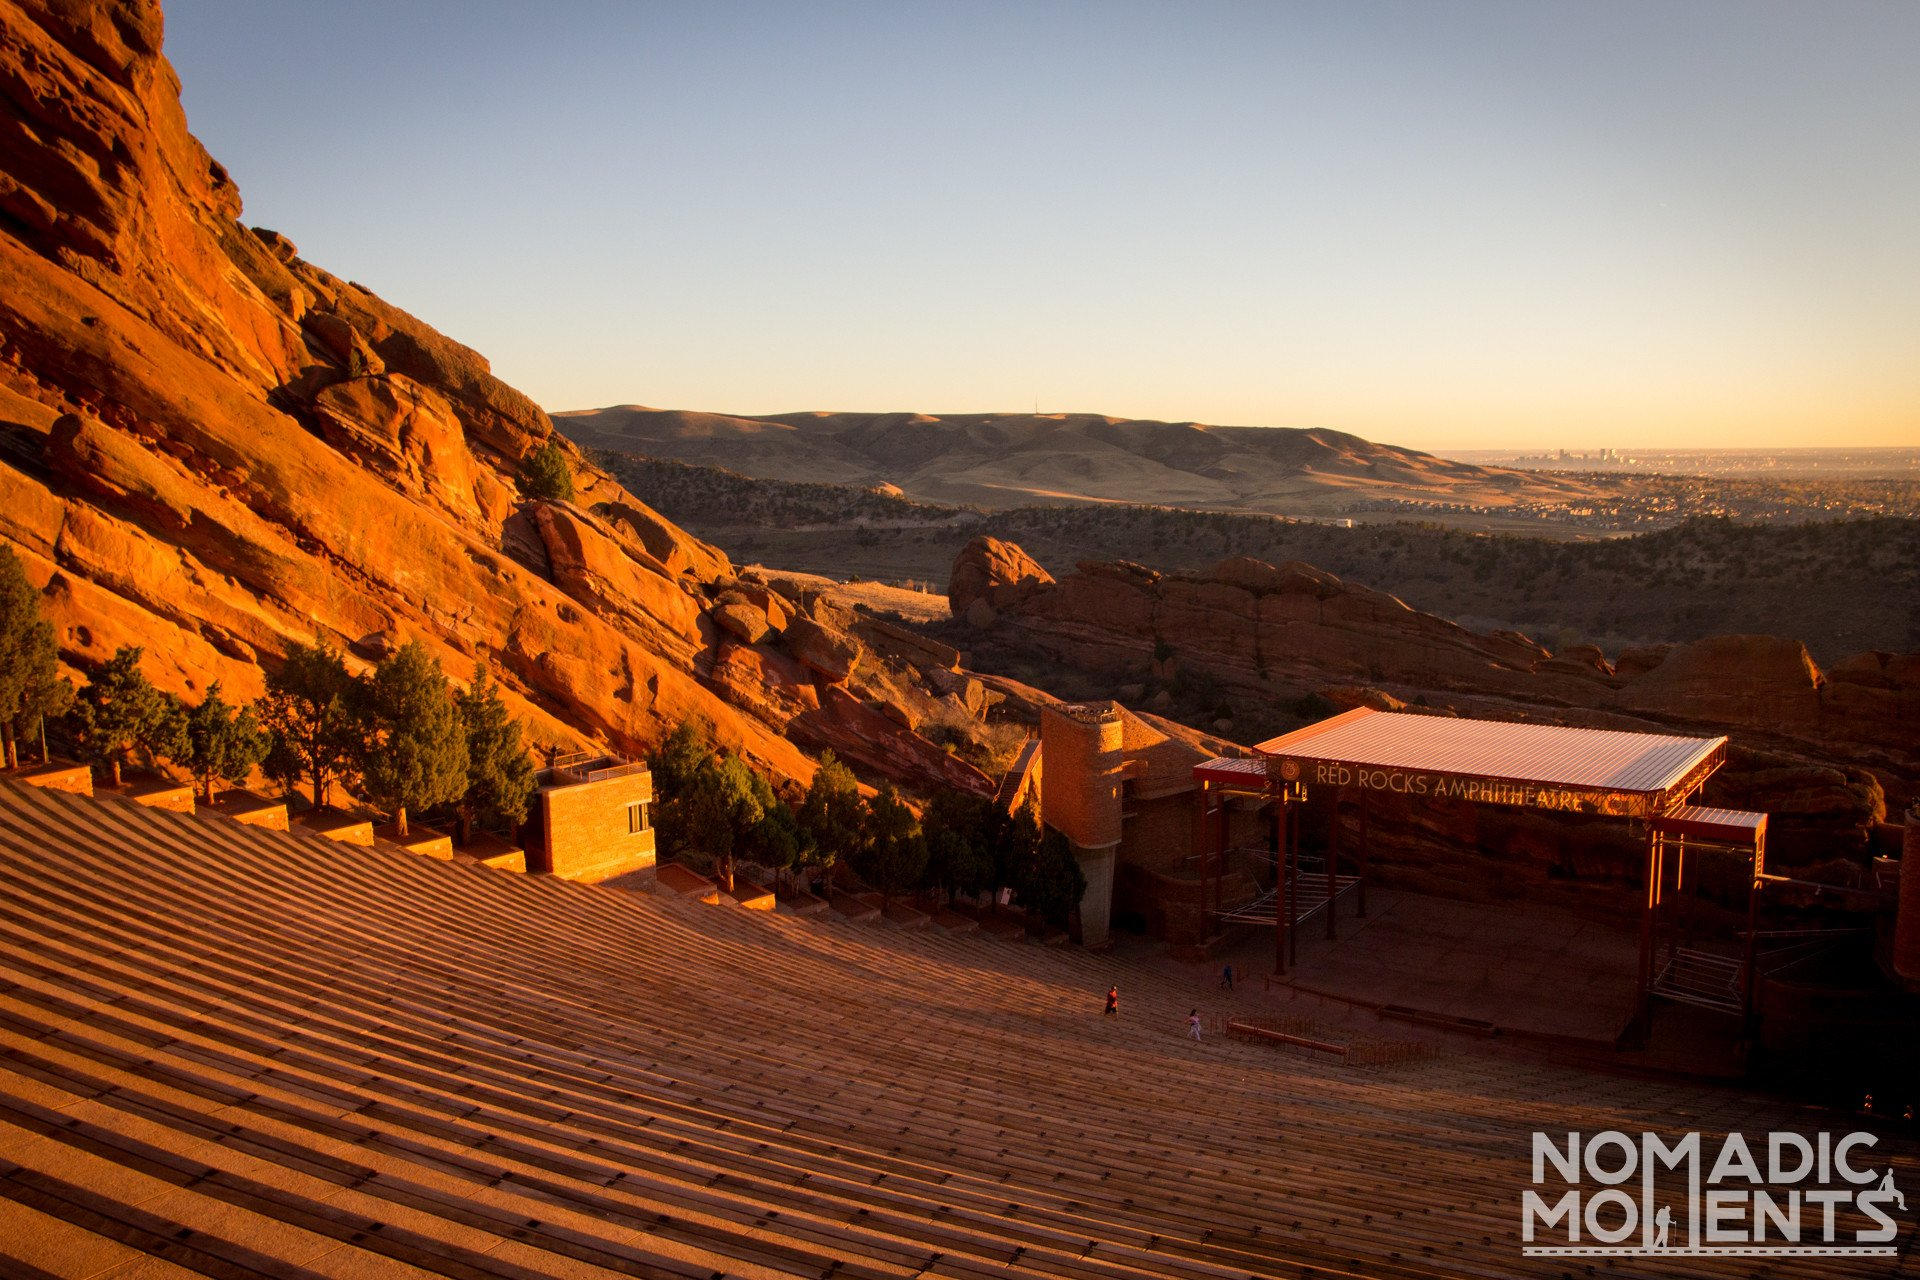 Red Rock Amphitheatre - Greatest Colorado Road Trip